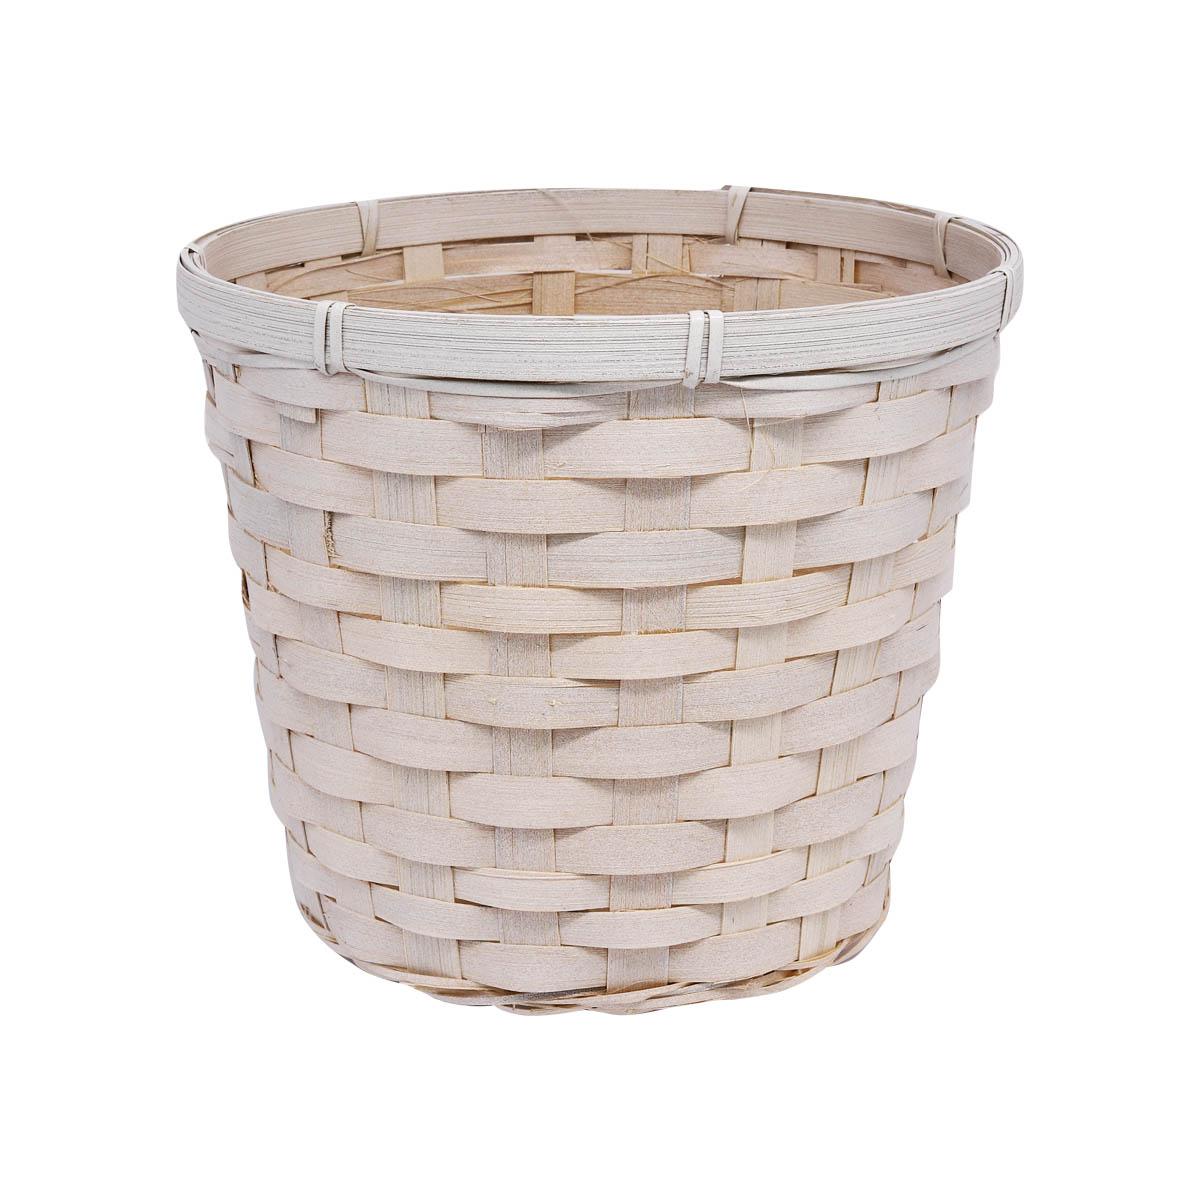 19HJ19075 Корзина плетеная бамбук 19*19см*Н15см, цв. белый Астра